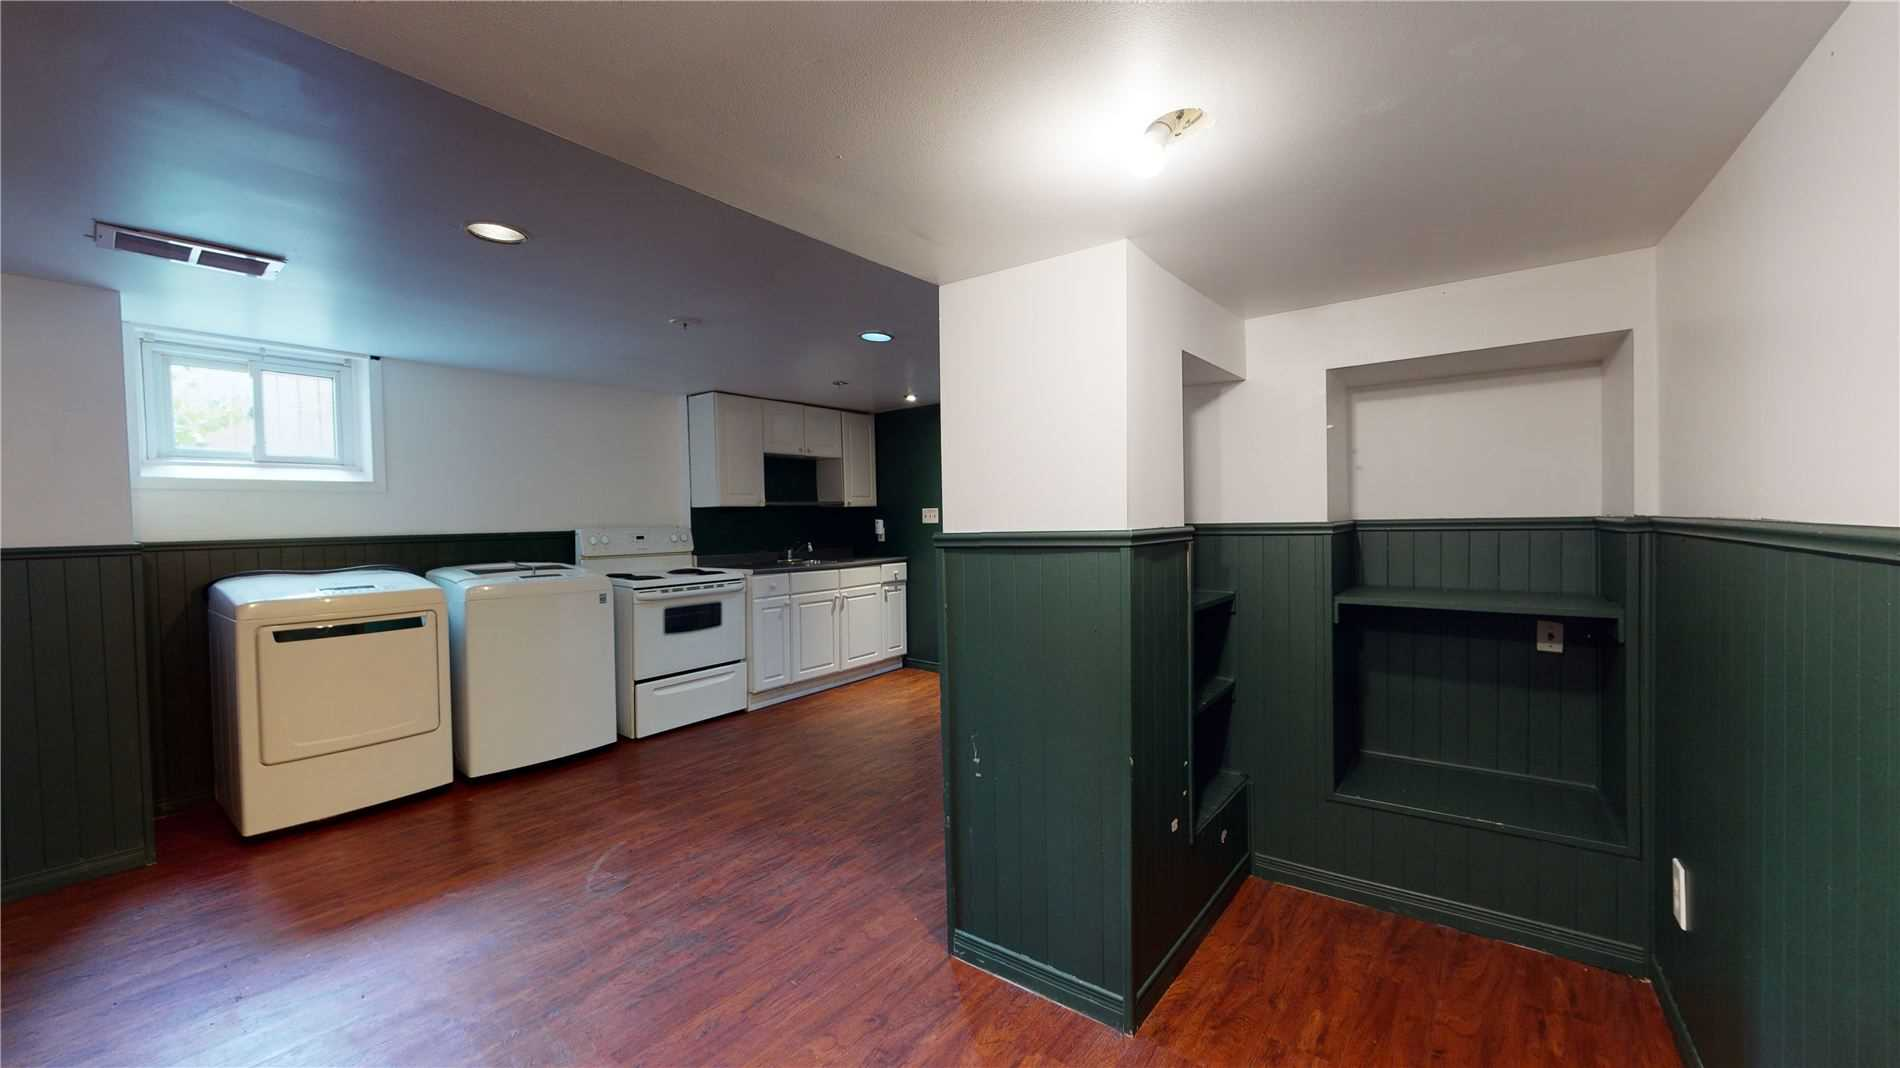 77 Robert Wallace Dr, Kingston, Ontario K7M 1X9, 4 Bedrooms Bedrooms, 9 Rooms Rooms,3 BathroomsBathrooms,Duplex,For Sale,Robert Wallace,X5330431